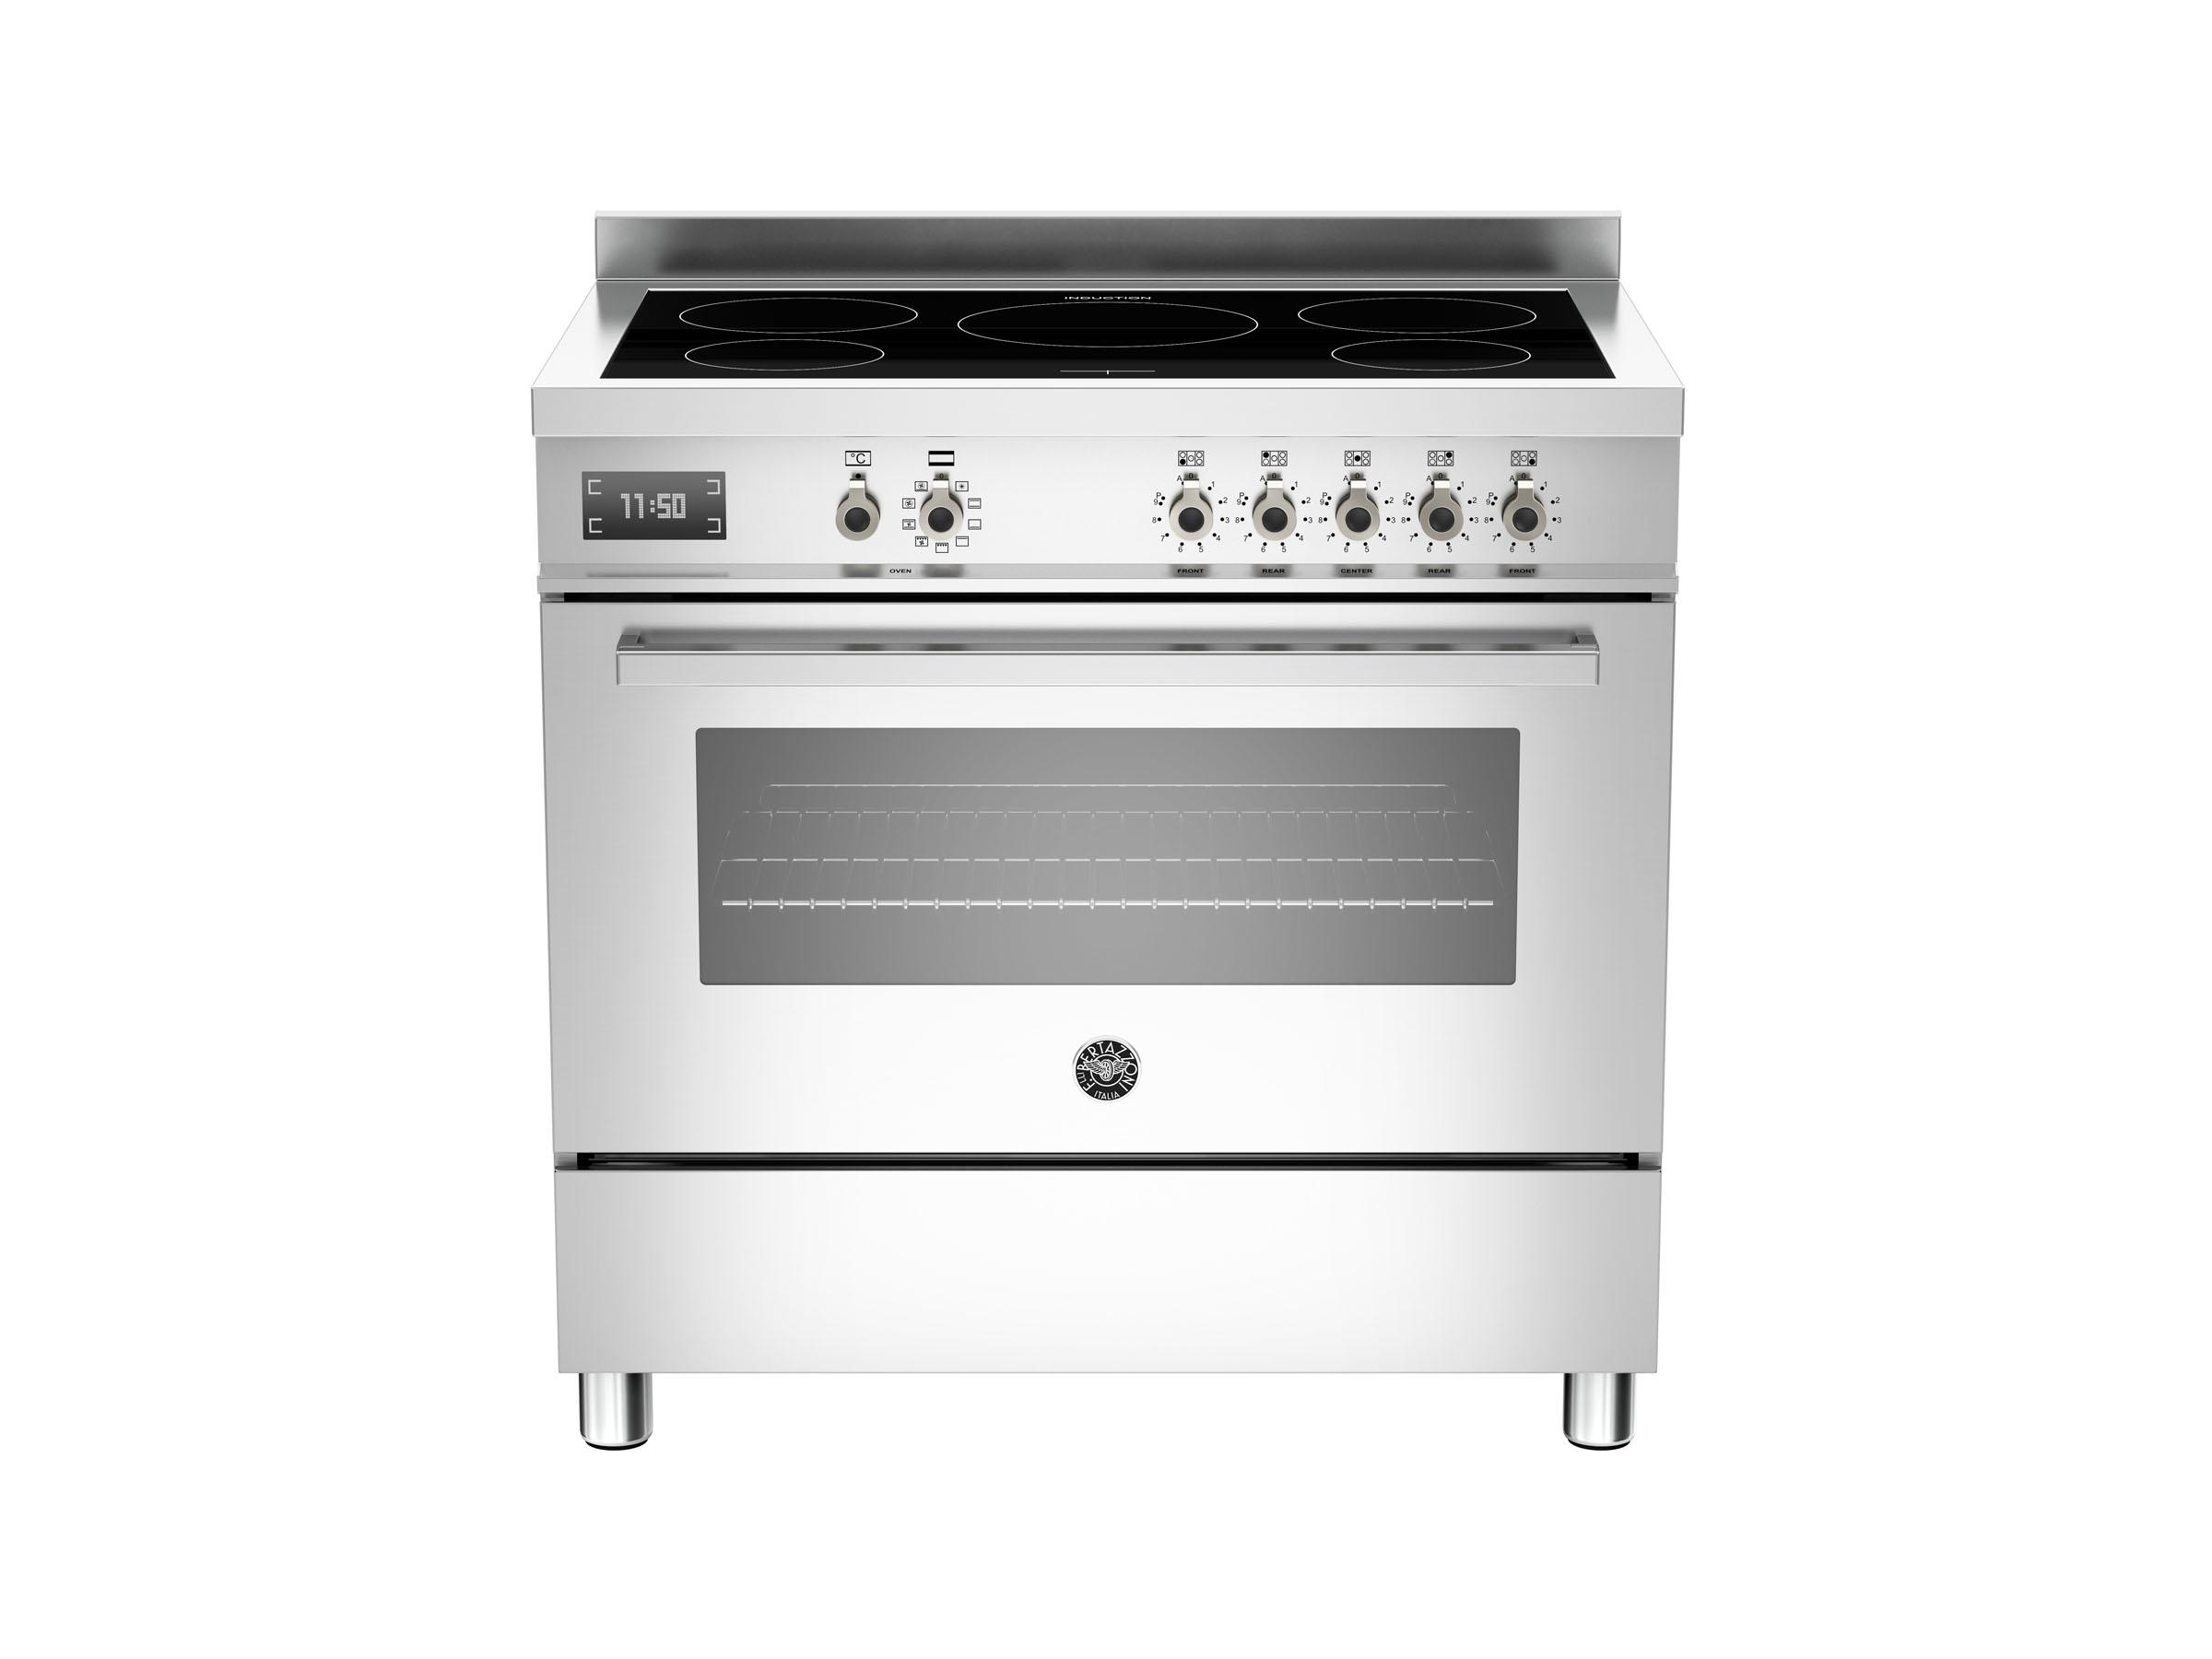 90 cm piano a induzione, forno elettrico | bertazzoni - Induzione Cucina